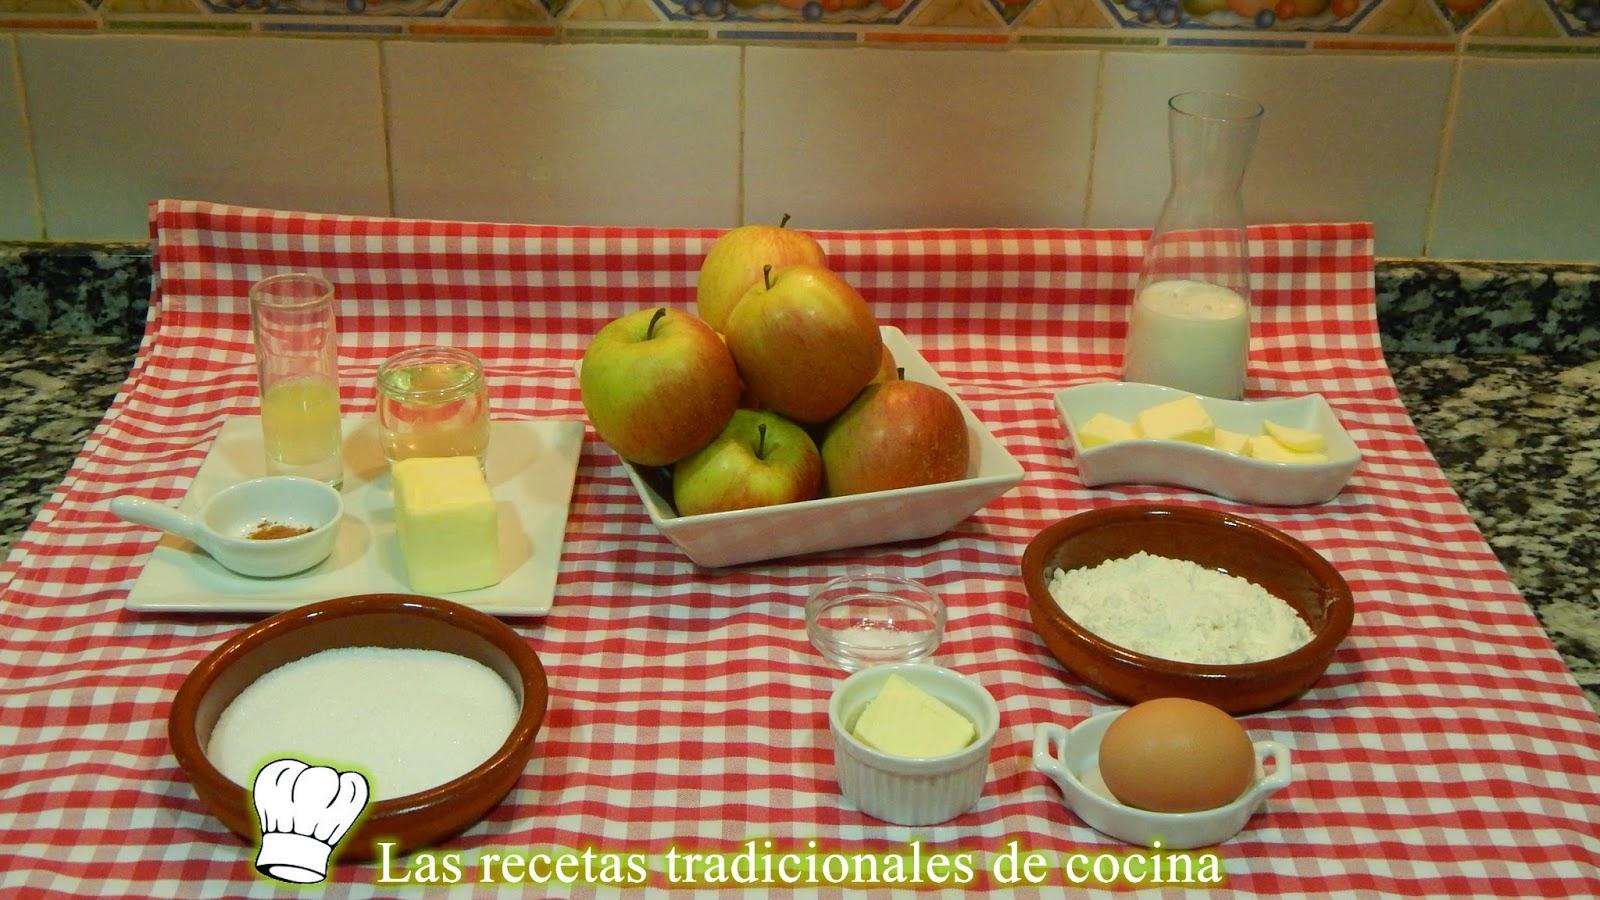 Receta de crepes rellenos de manzana